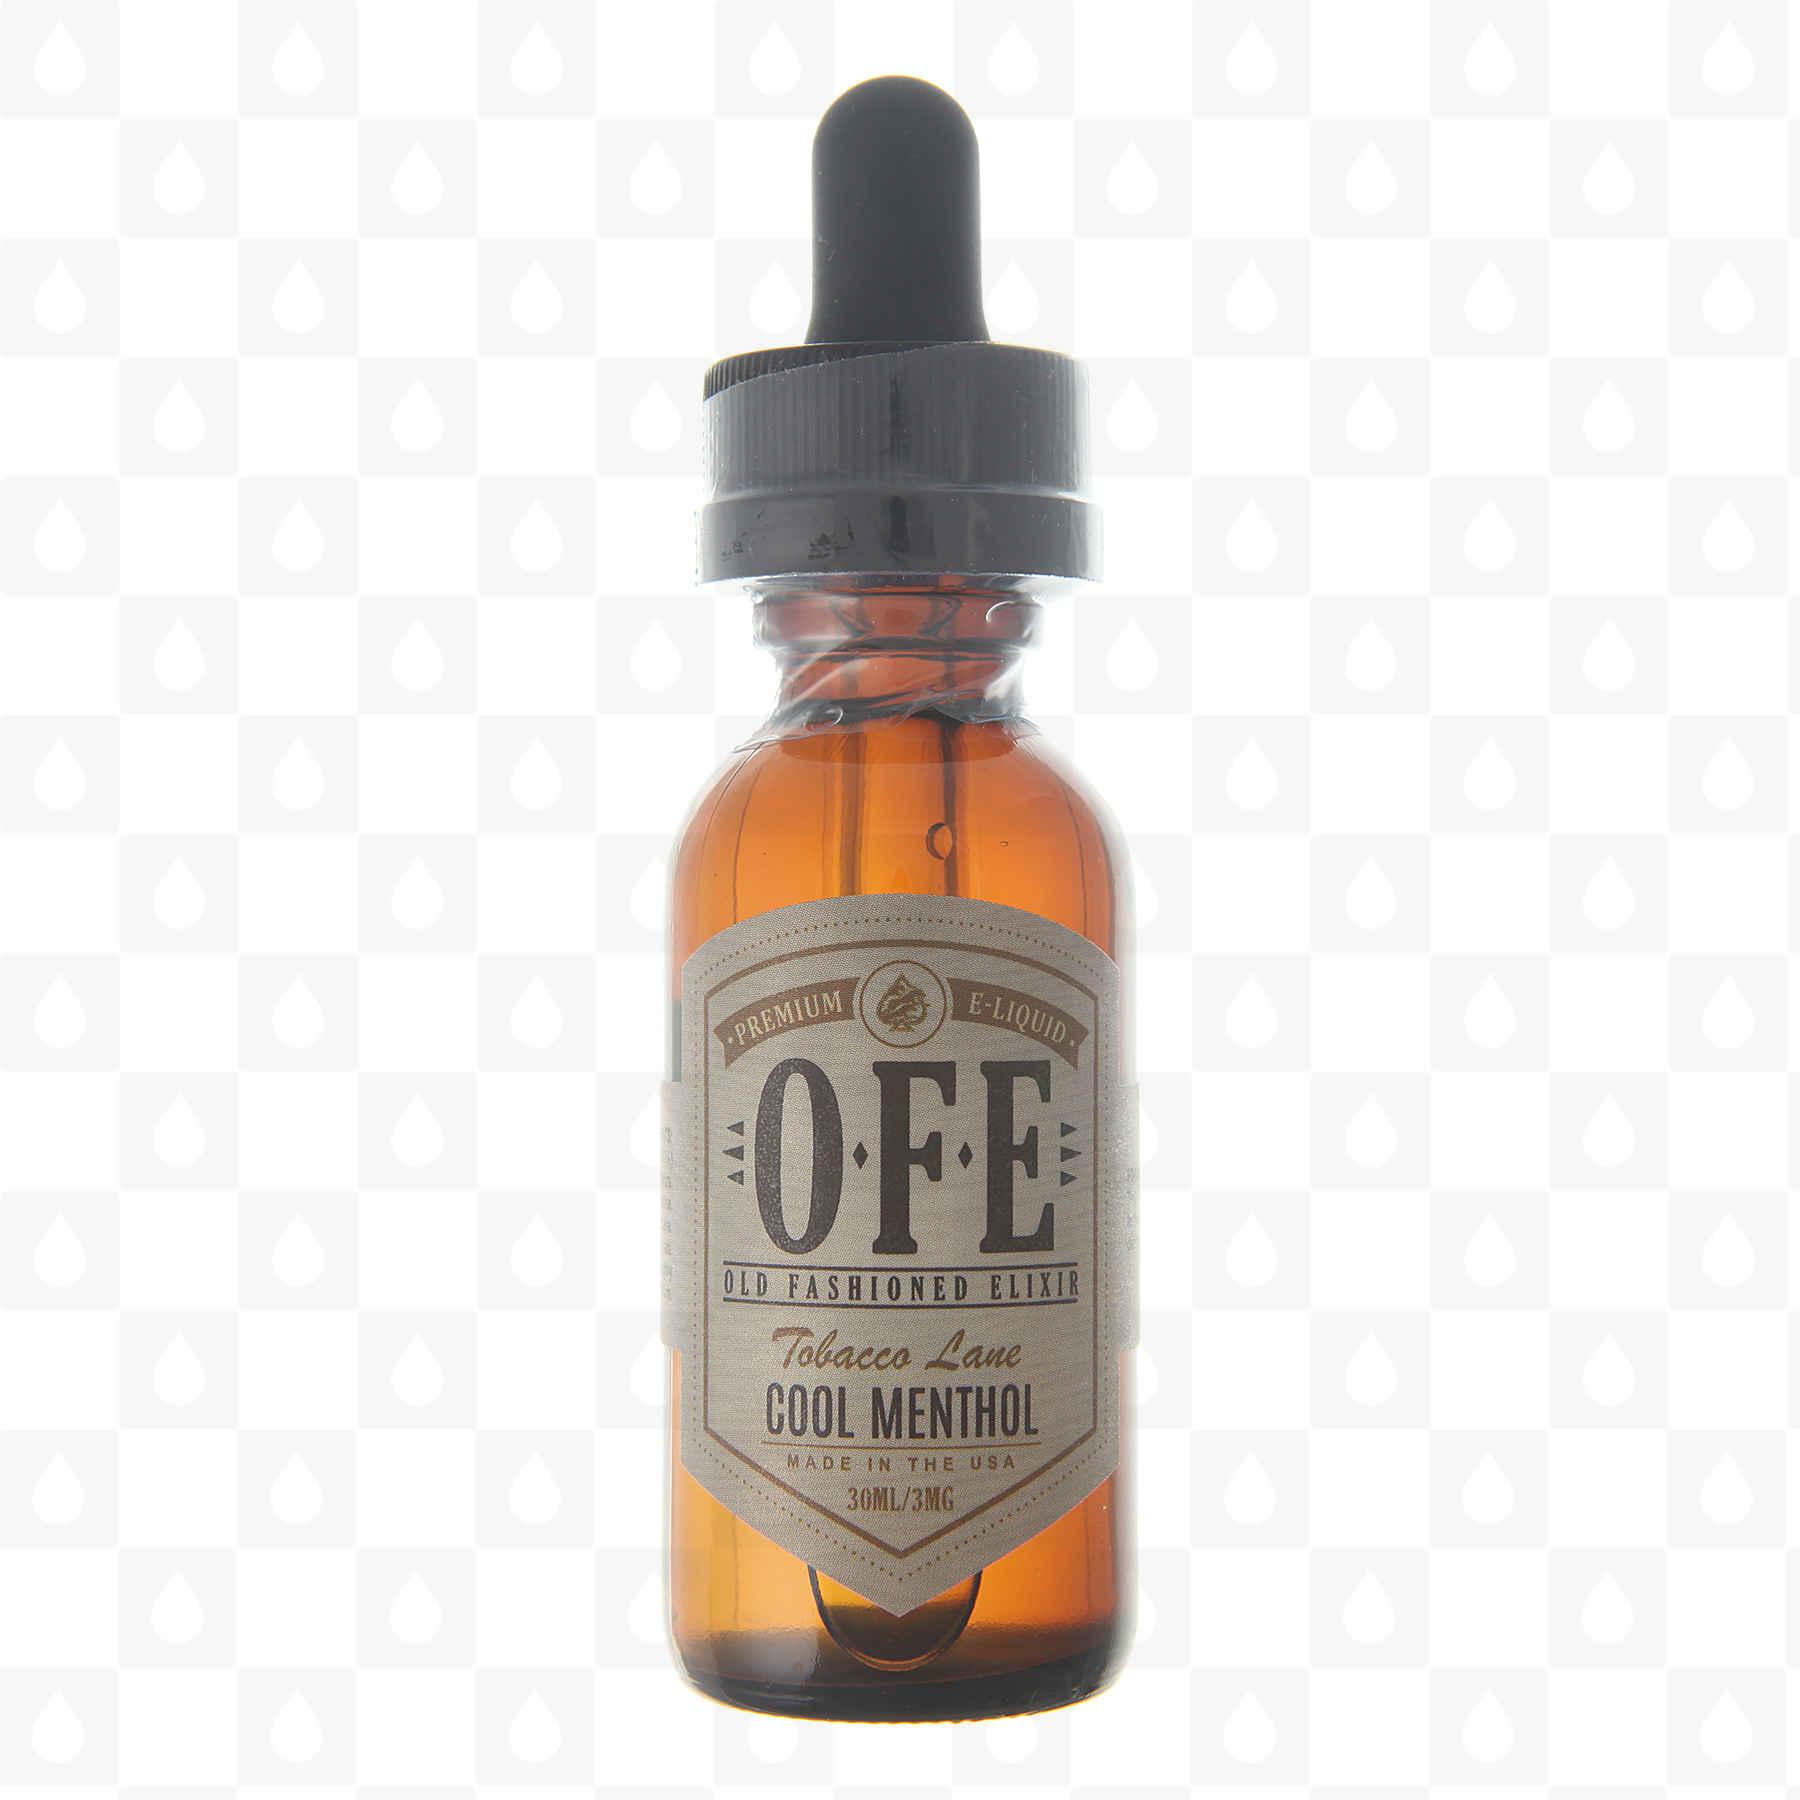 Old Fashioned Elixir Cool Menthol